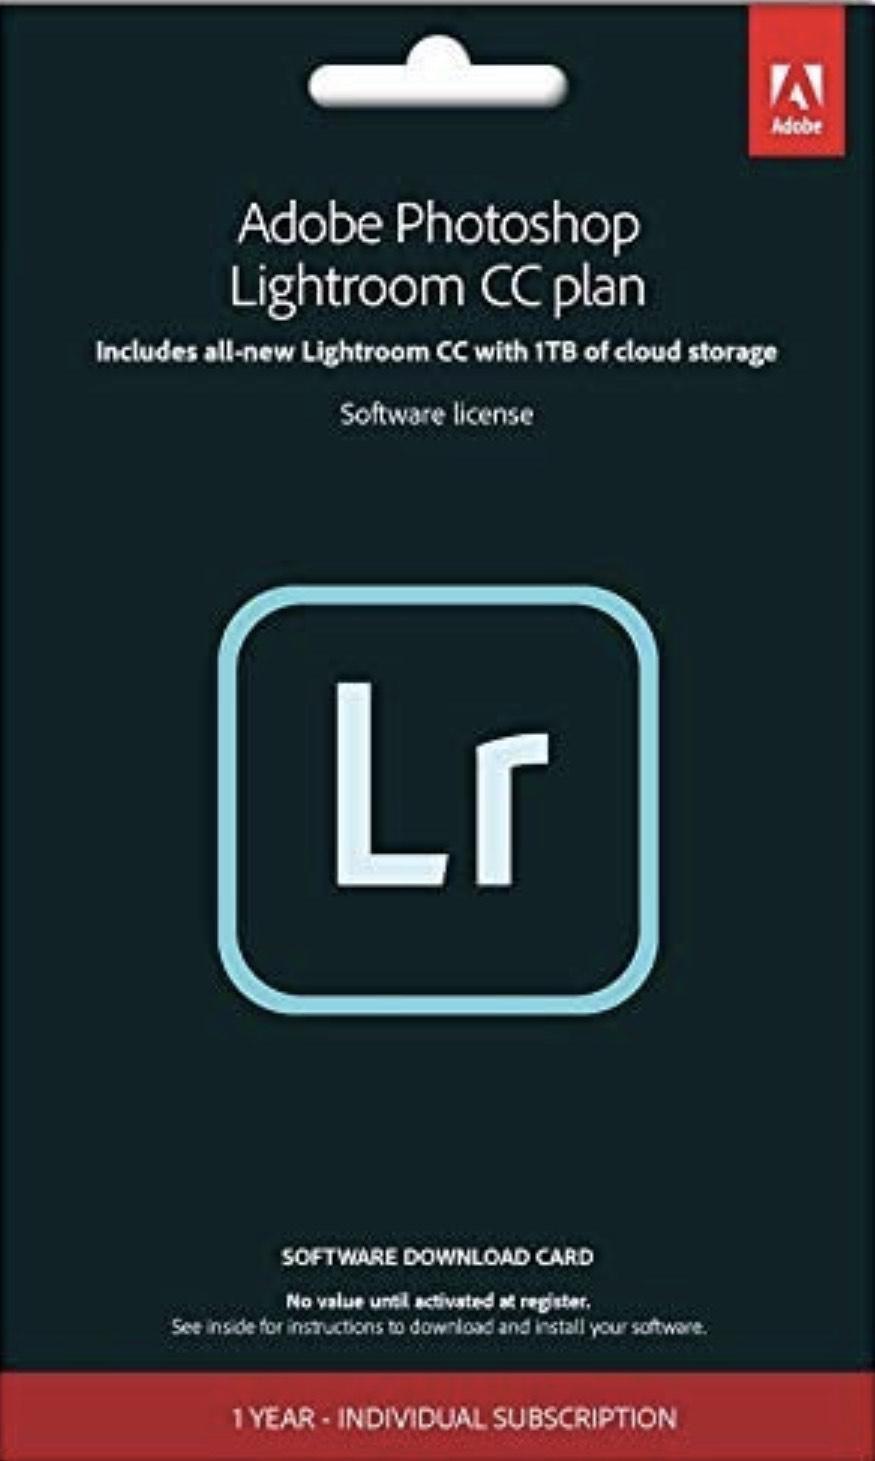 Adobe Lightroom CC 1TB - 1 year subscription £32.42 Amazon